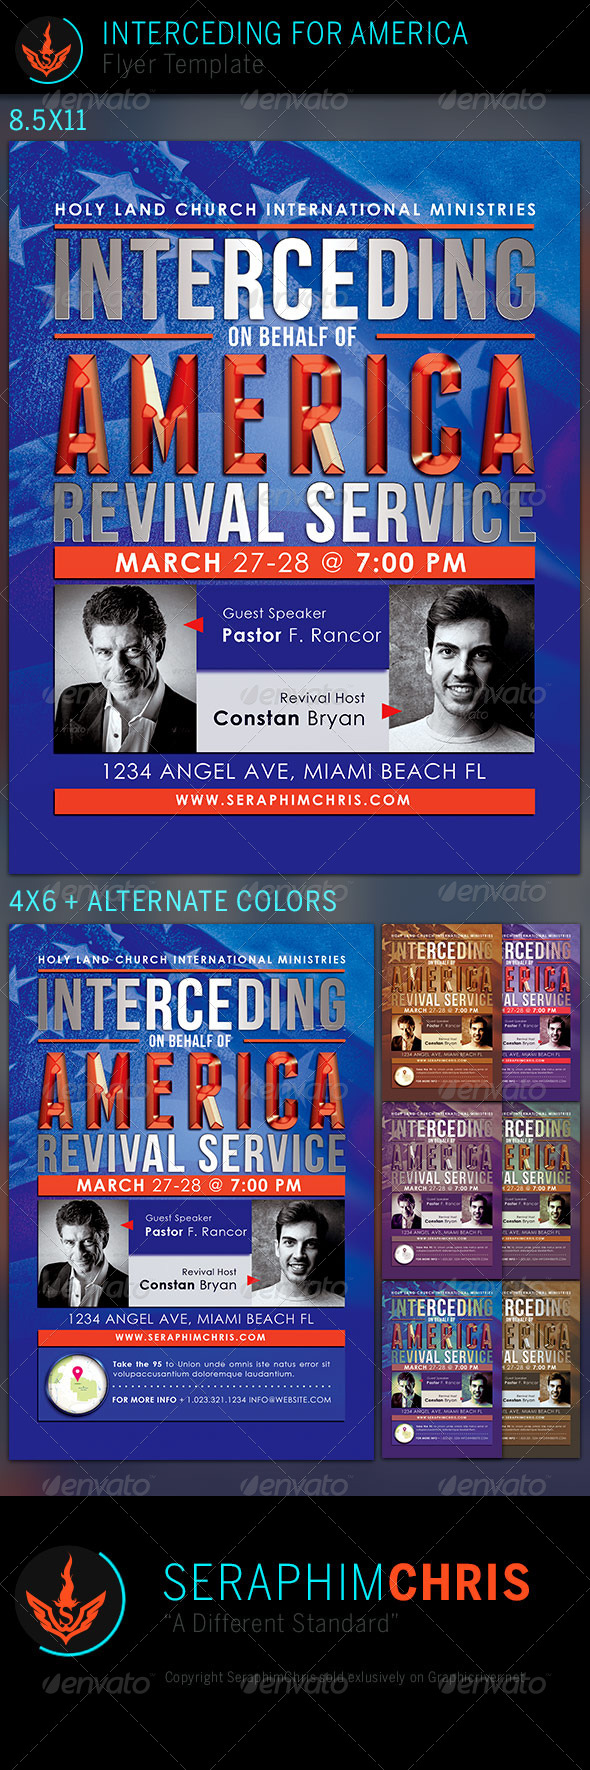 GraphicRiver Interceding for America Church Flyer Template 7524974